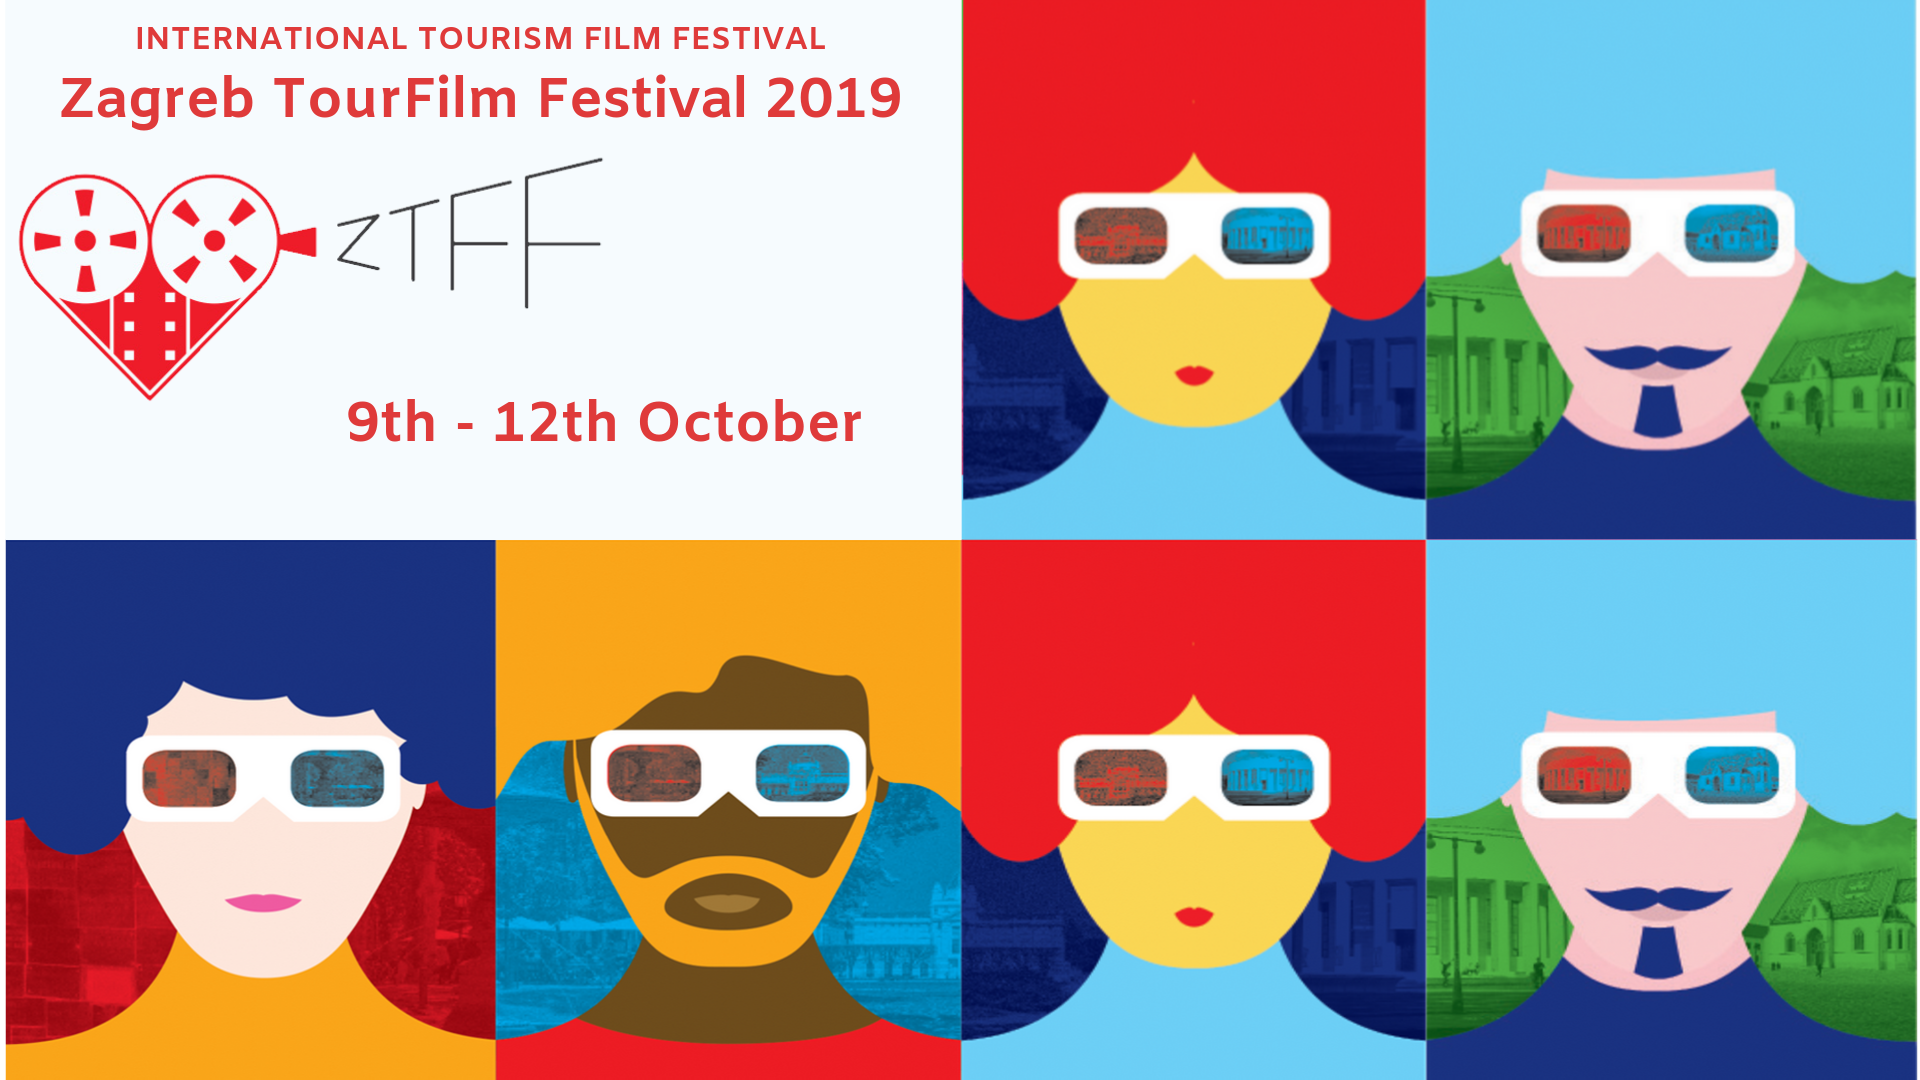 ZAGREB TOURFILM FESTIVAL 2019